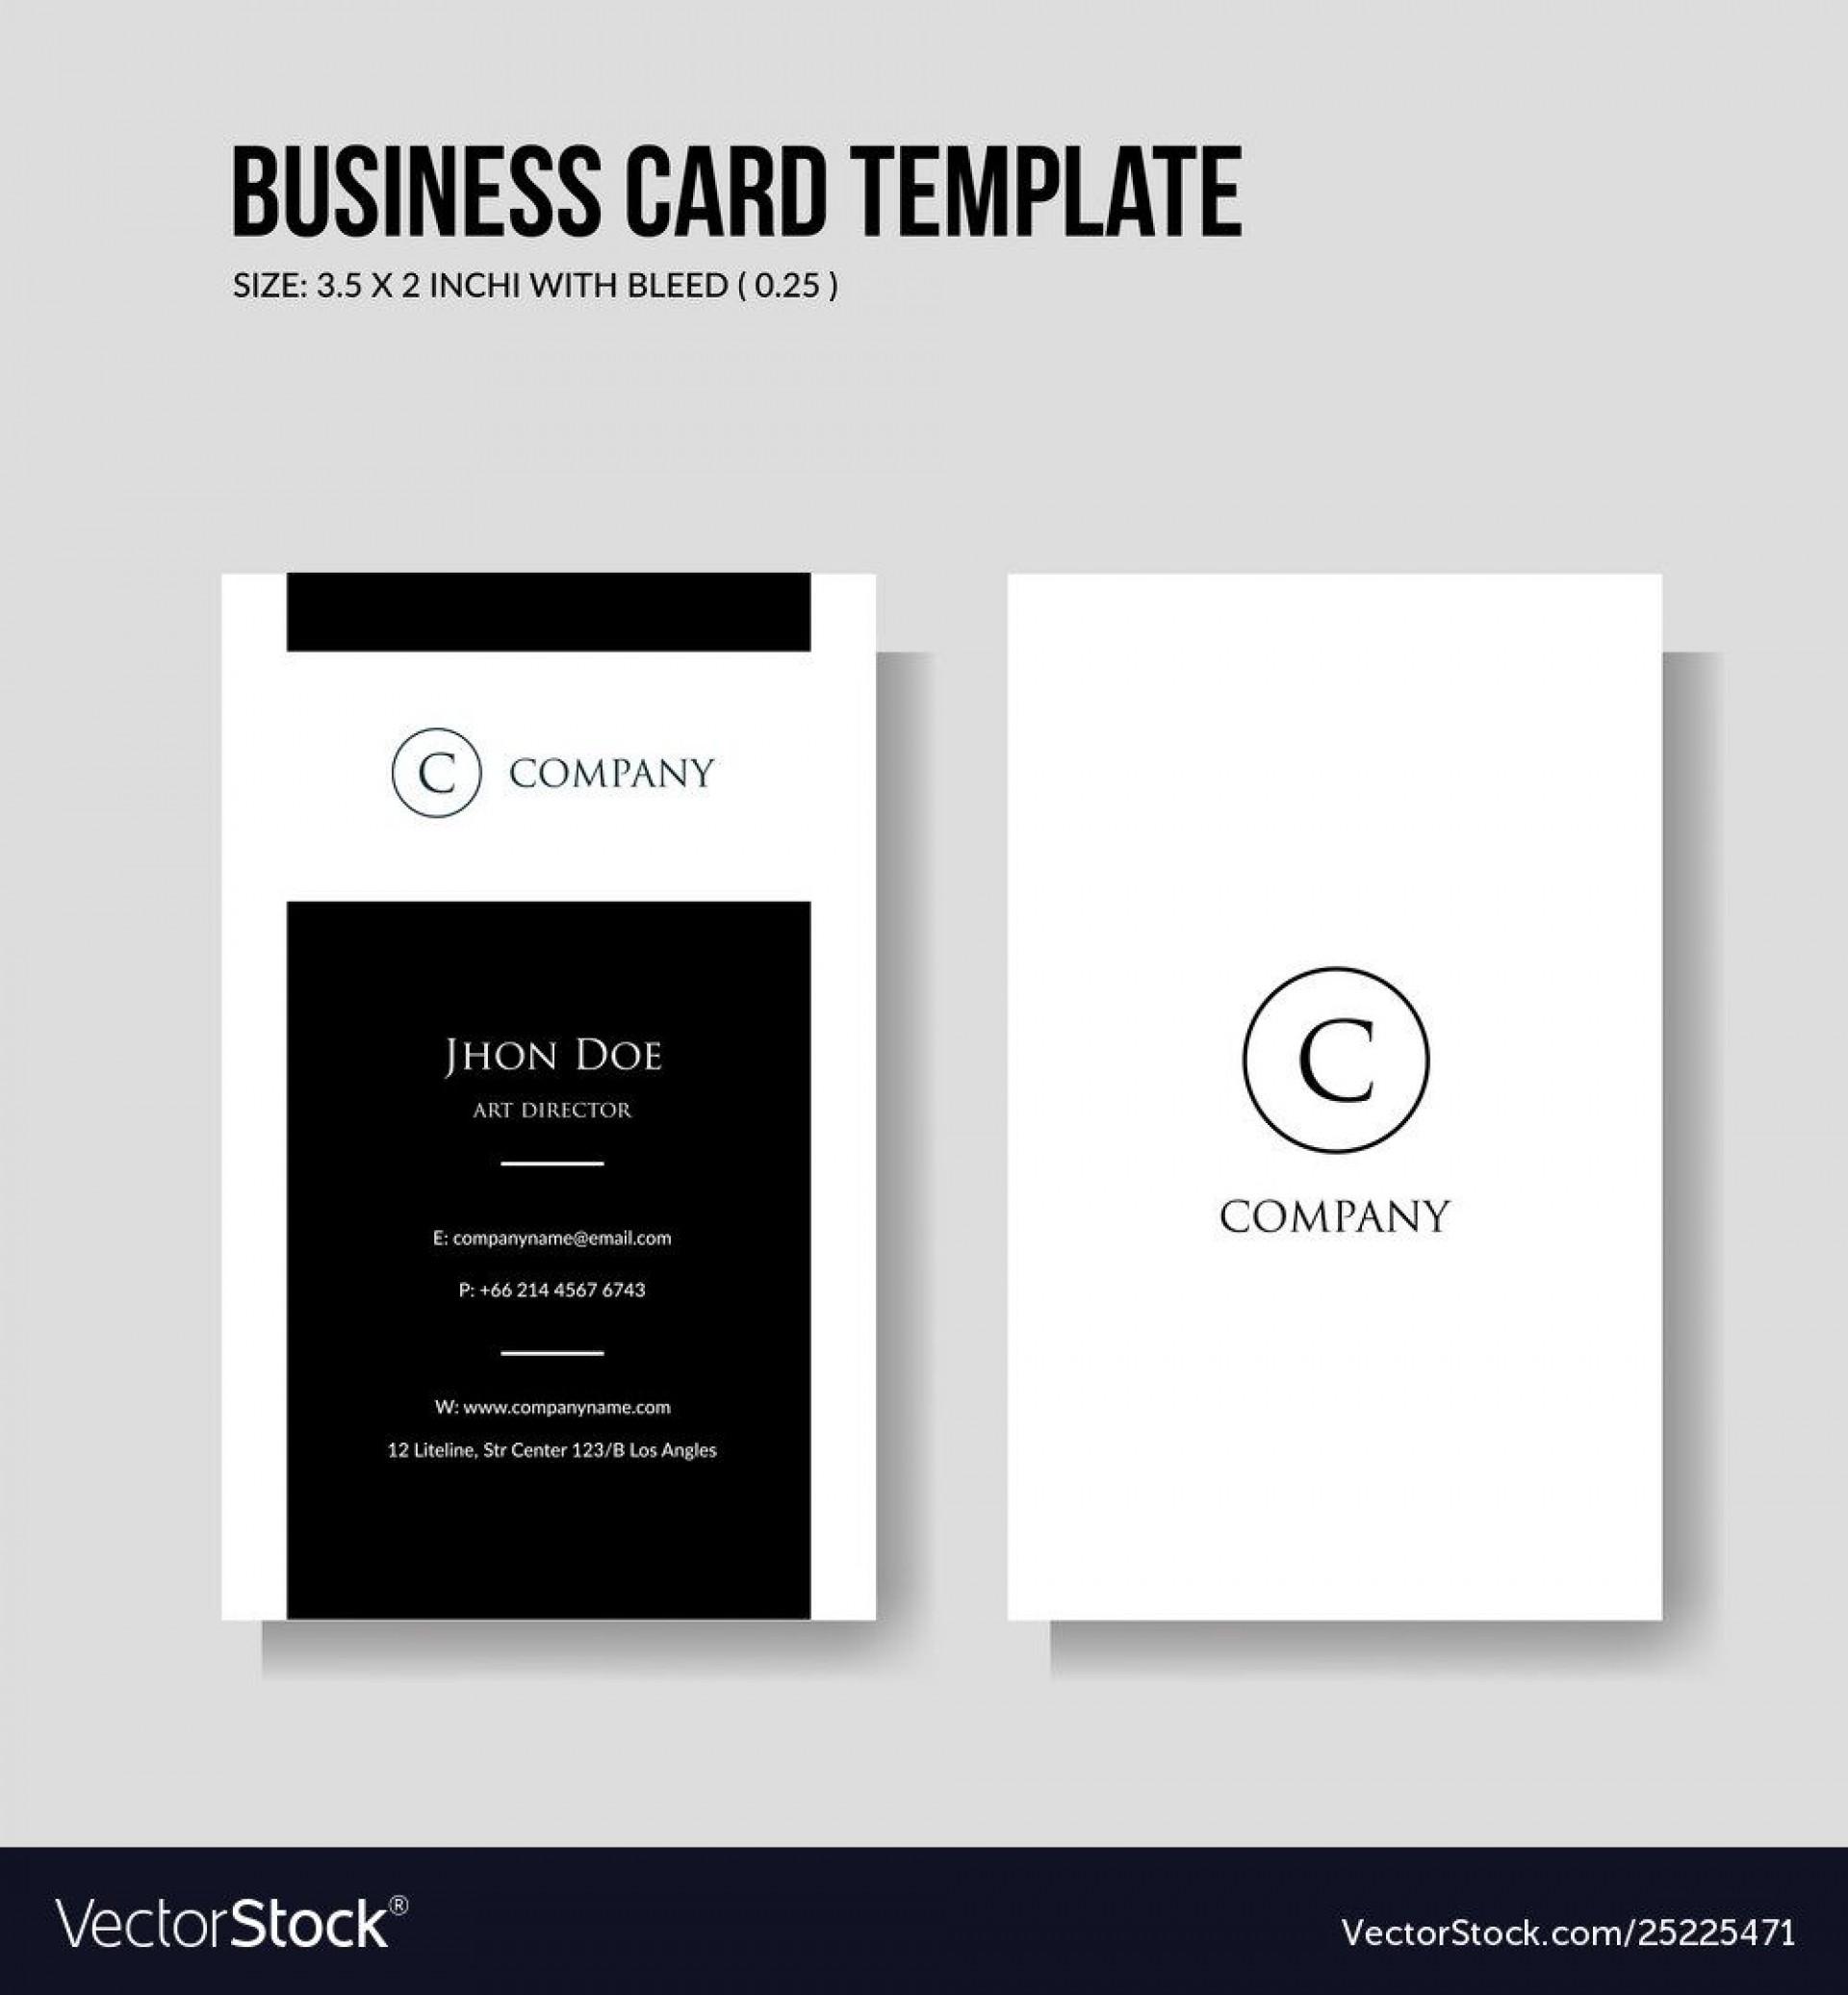 007 Astounding Minimalist Busines Card Template Free Idea  Minimal Psd1920